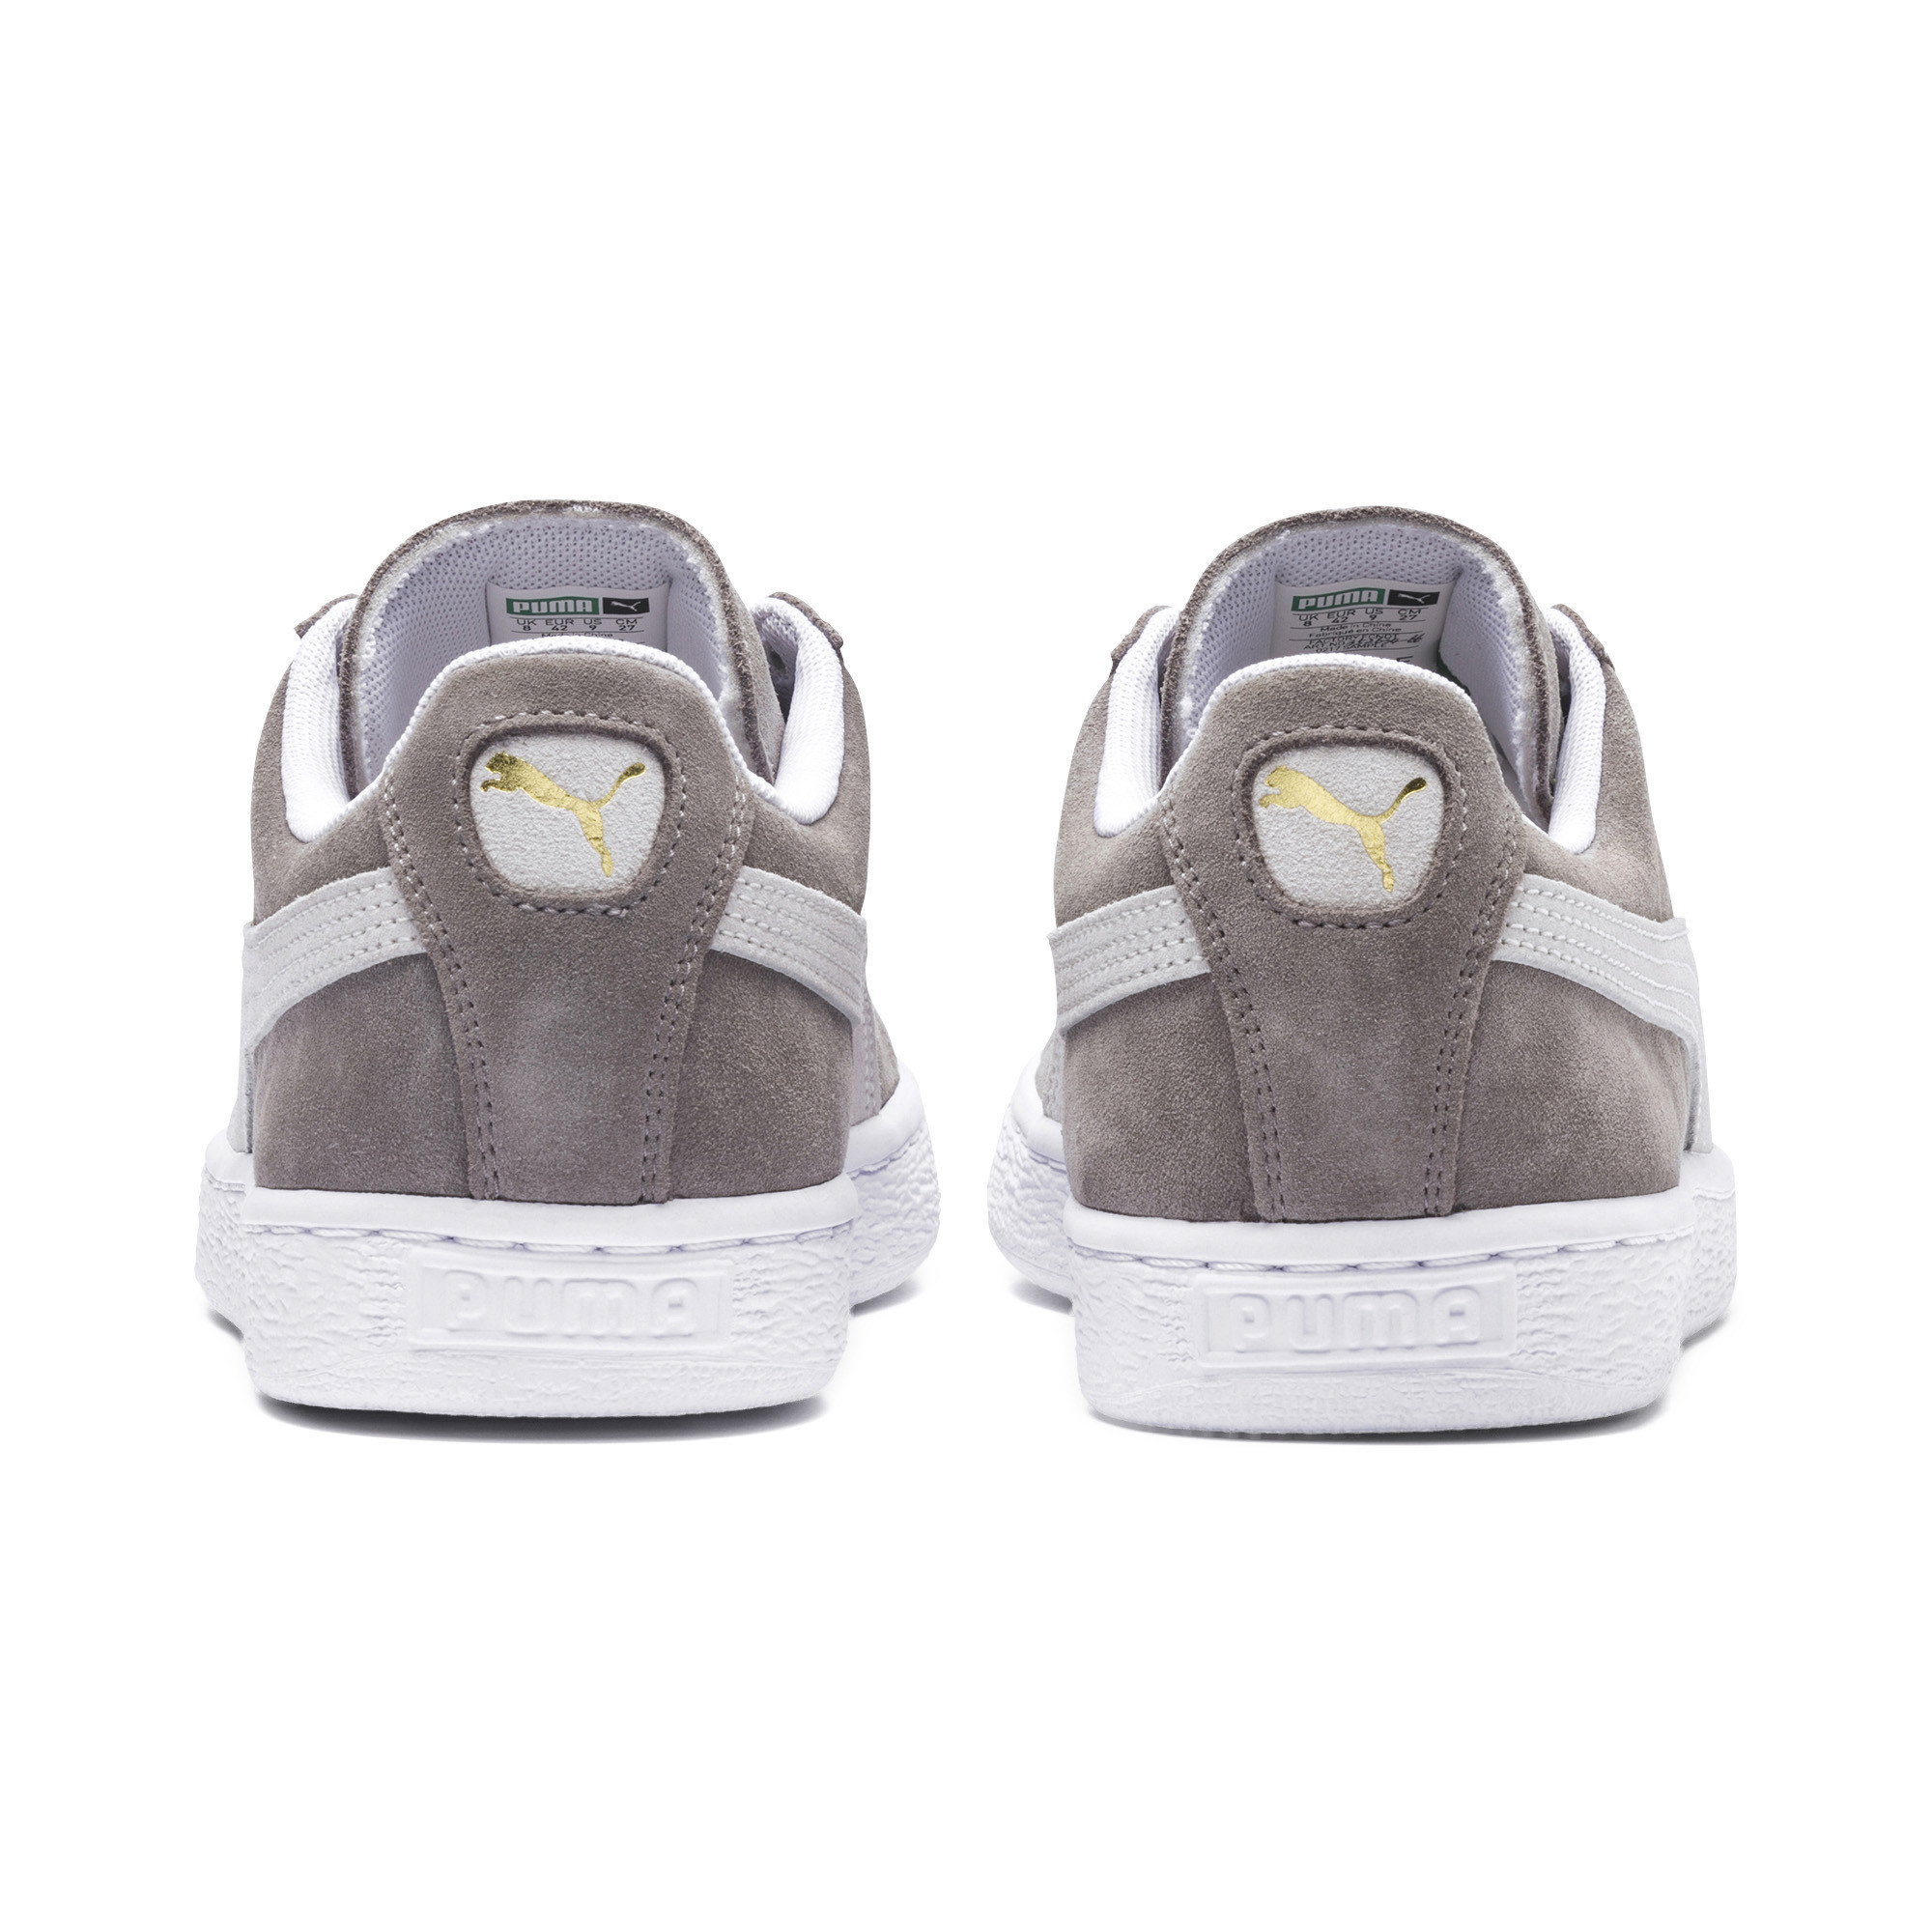 PUMA-Suede-Classic-Sneakers-Men-Shoe-Sport-Shoe thumbnail 12